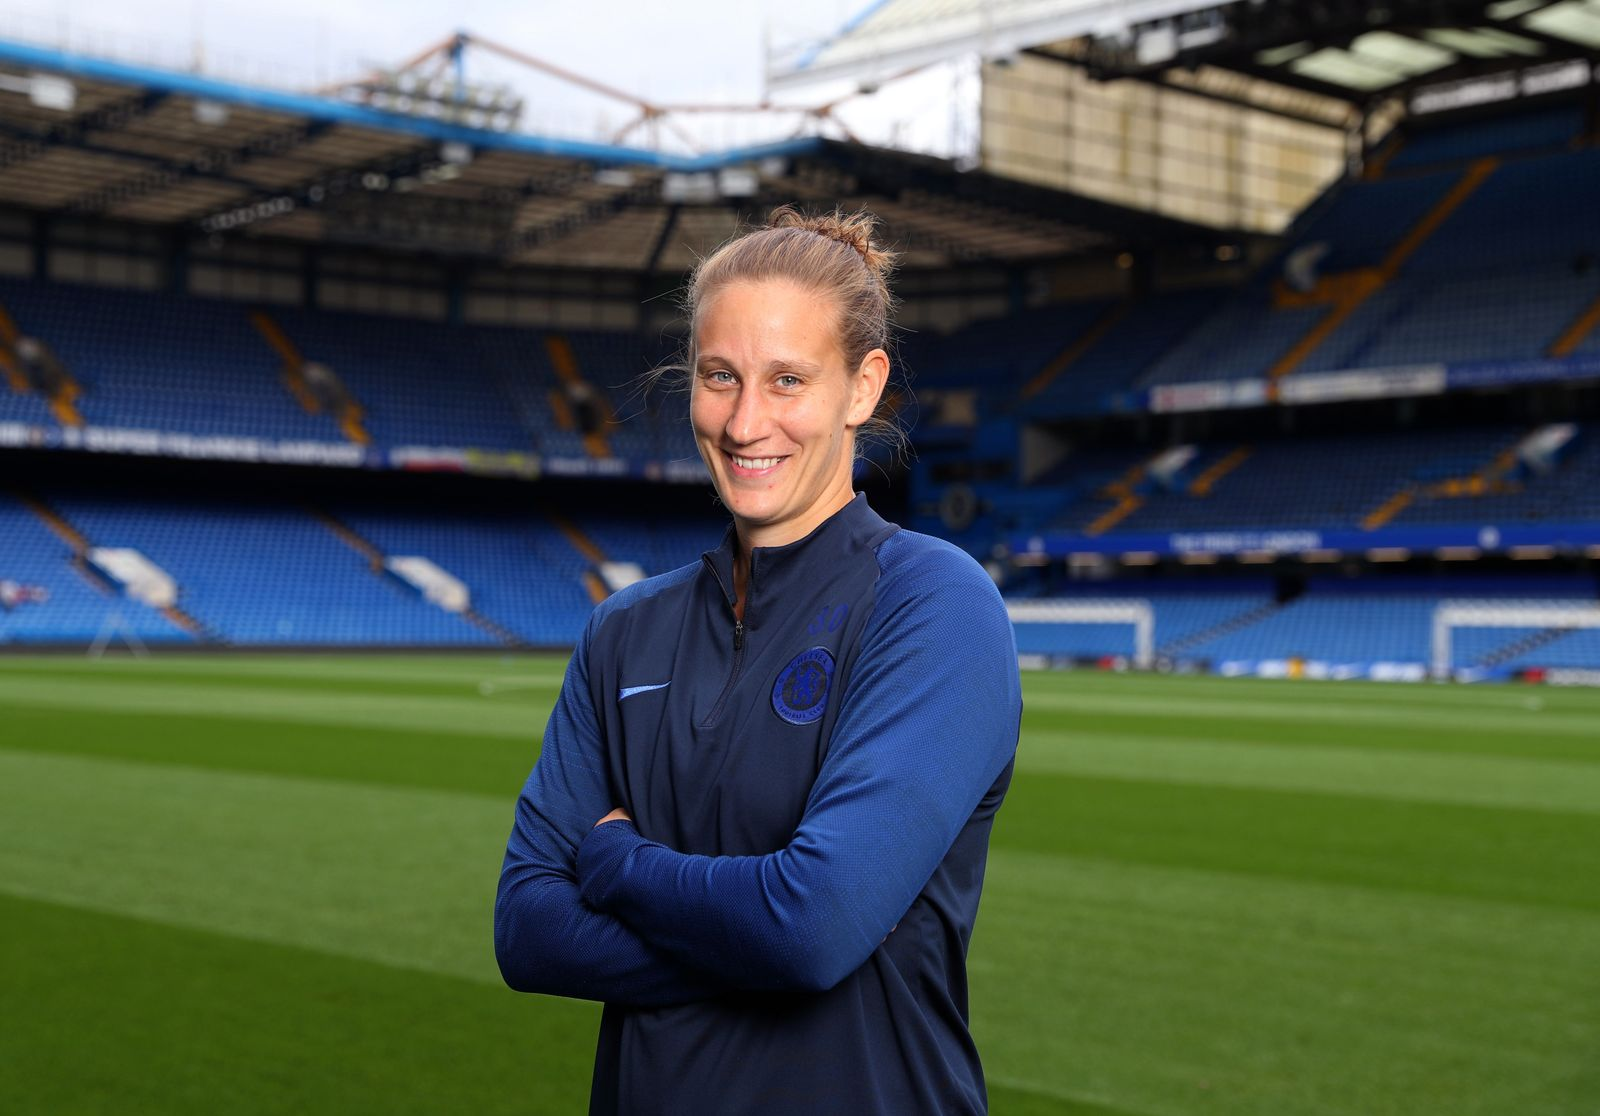 Chelsea FC Women Visit Stamford Bridge